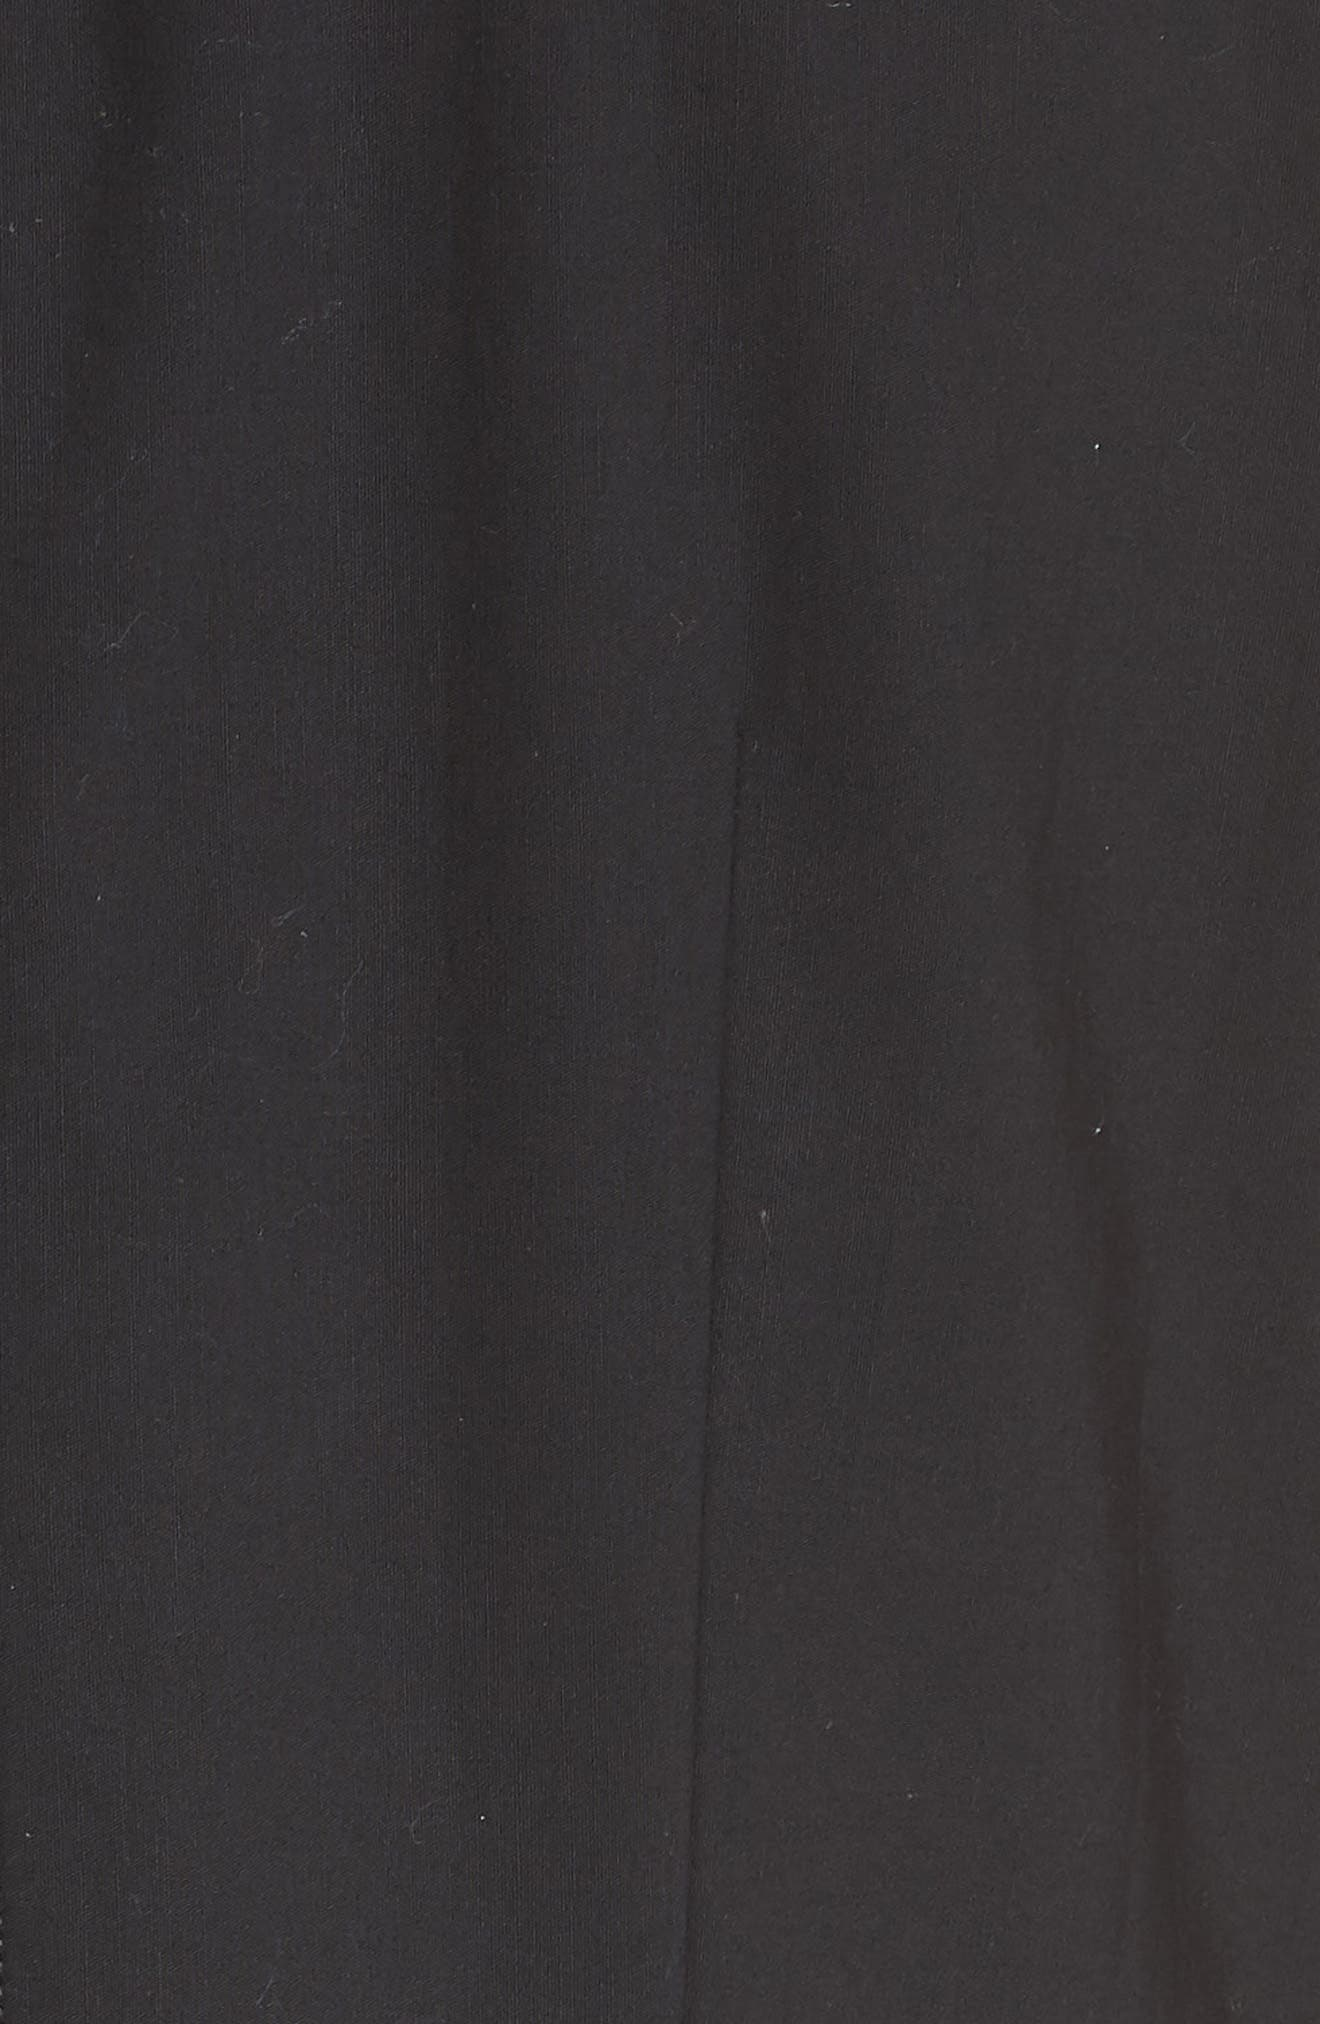 Embroidered Tulip Hem Dress,                             Alternate thumbnail 5, color,                             001